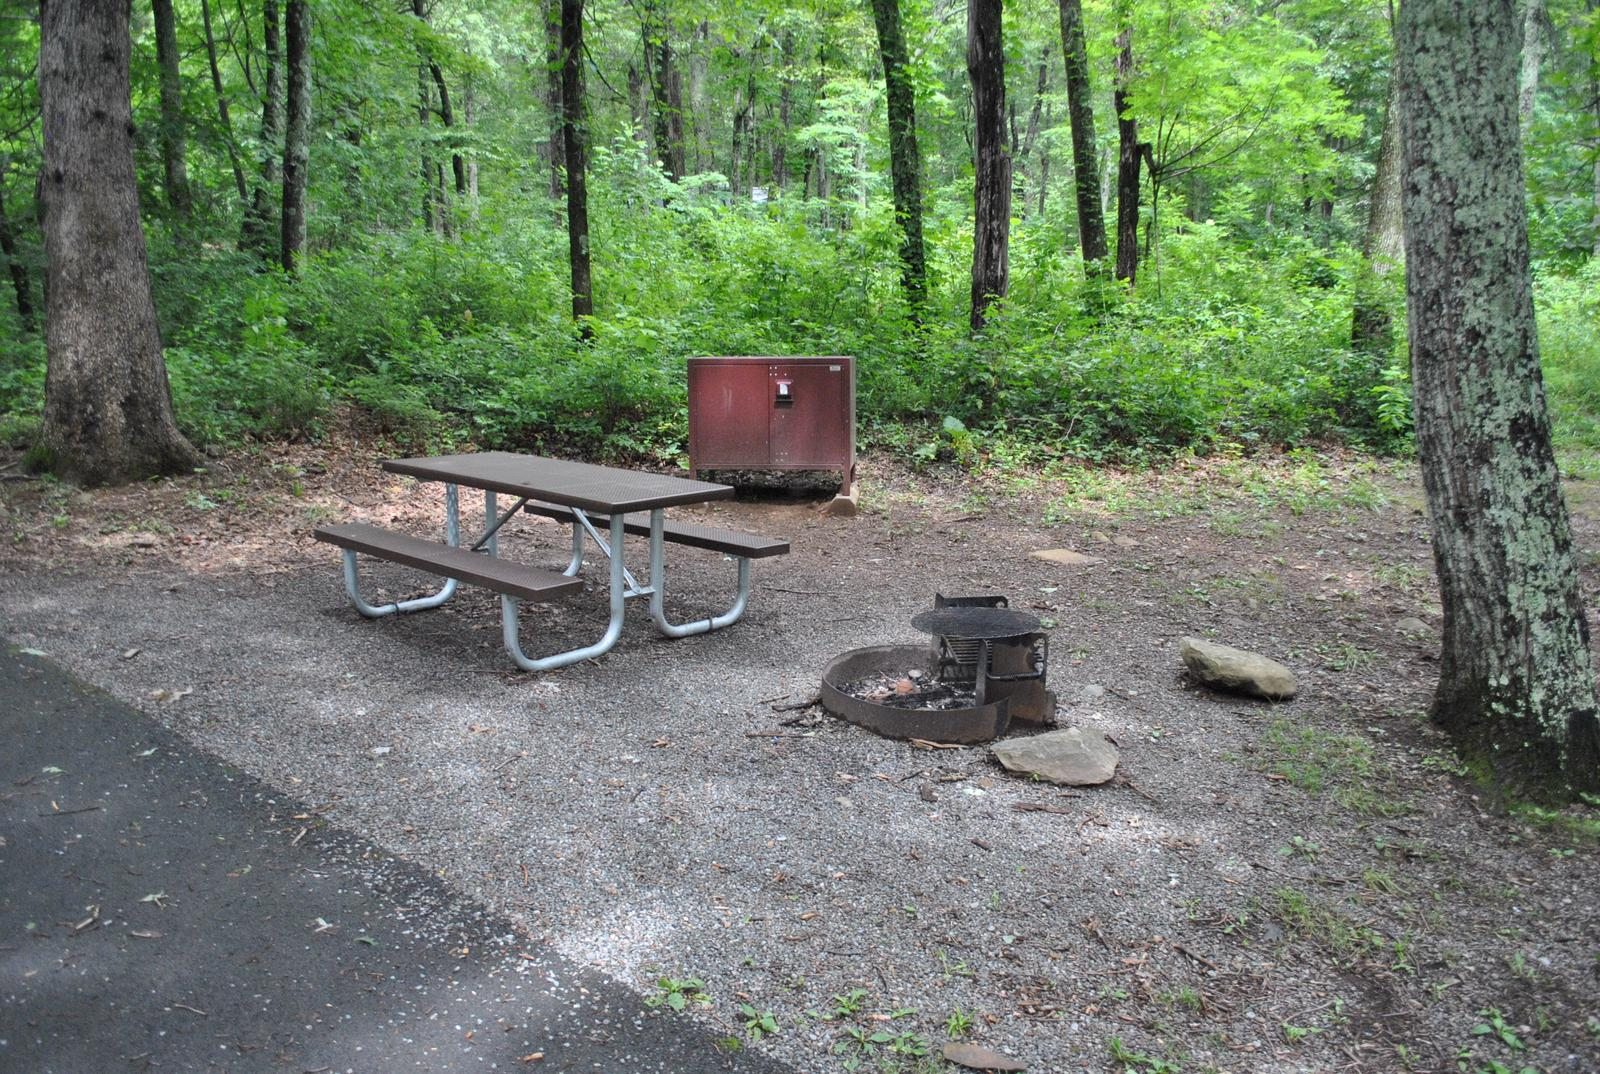 Mathews Arm Campground – Site A115